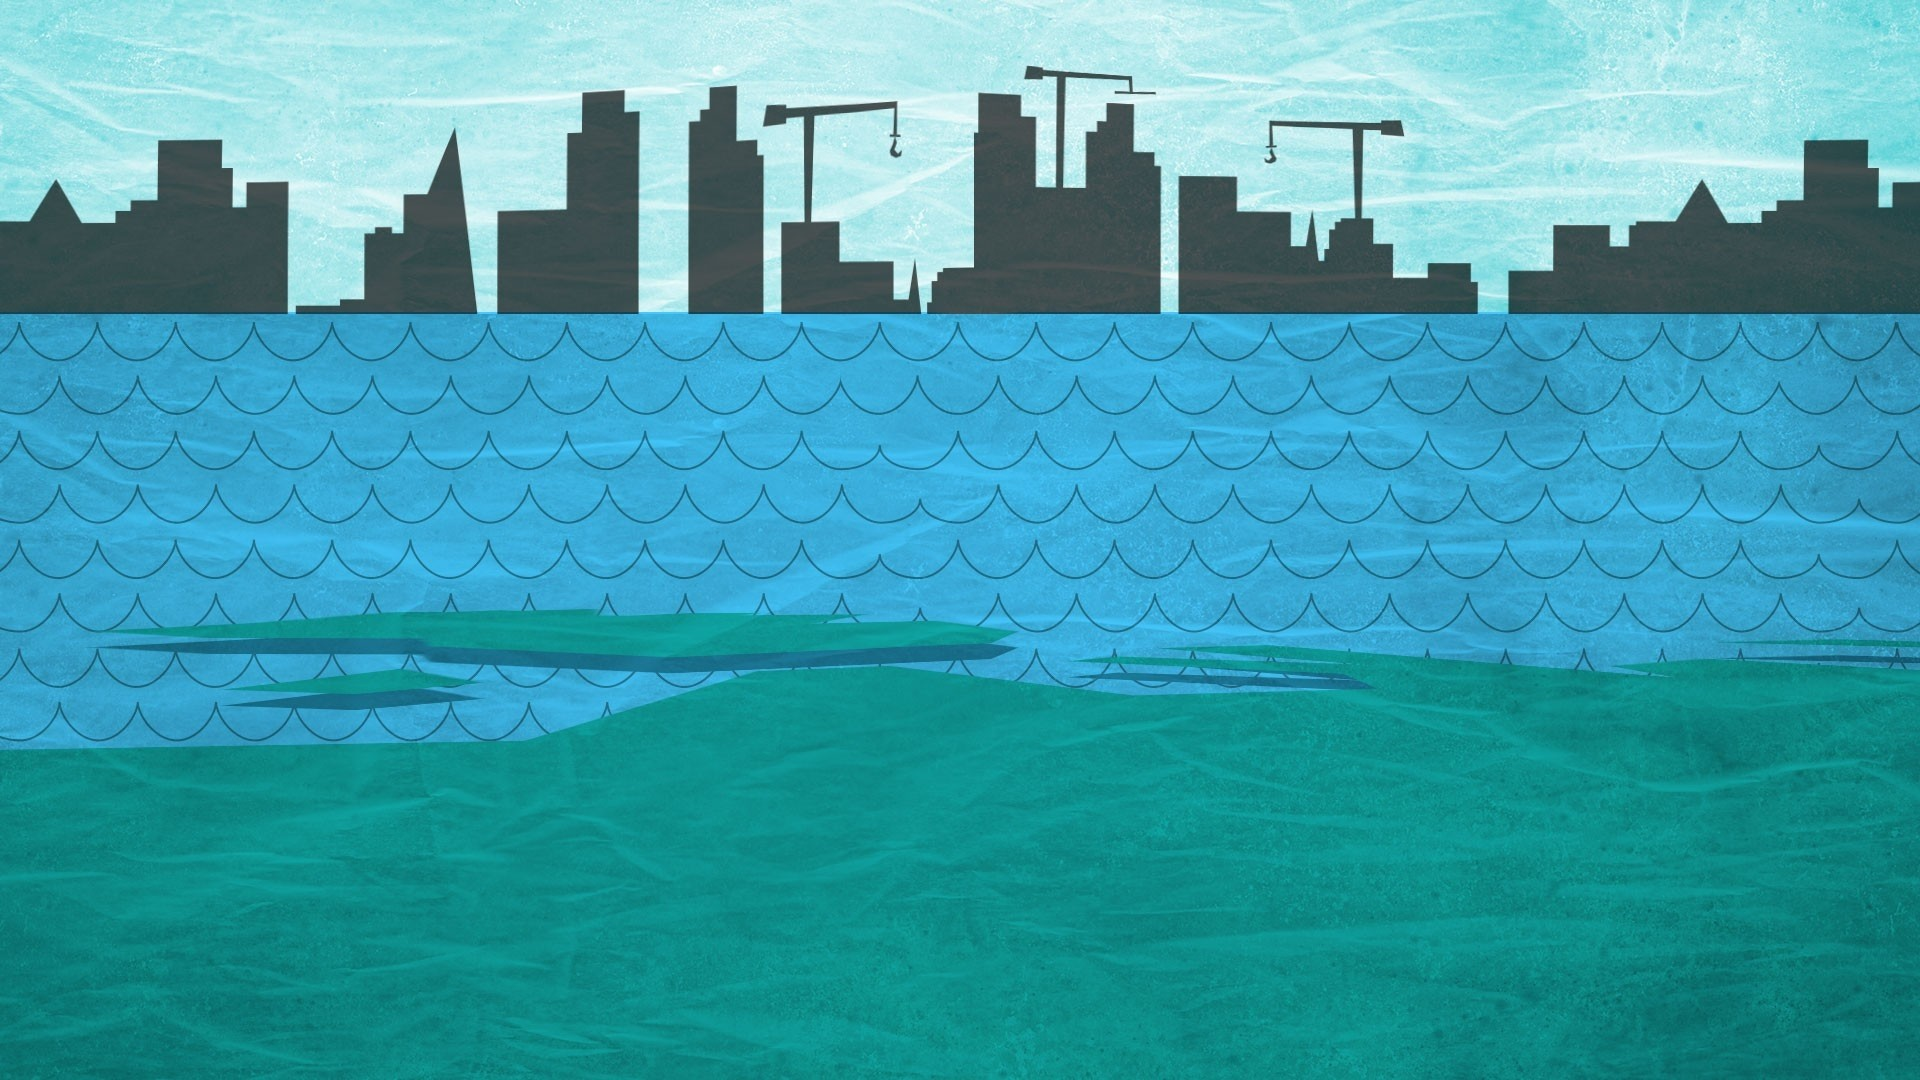 Water Minimalist computer wallpaper